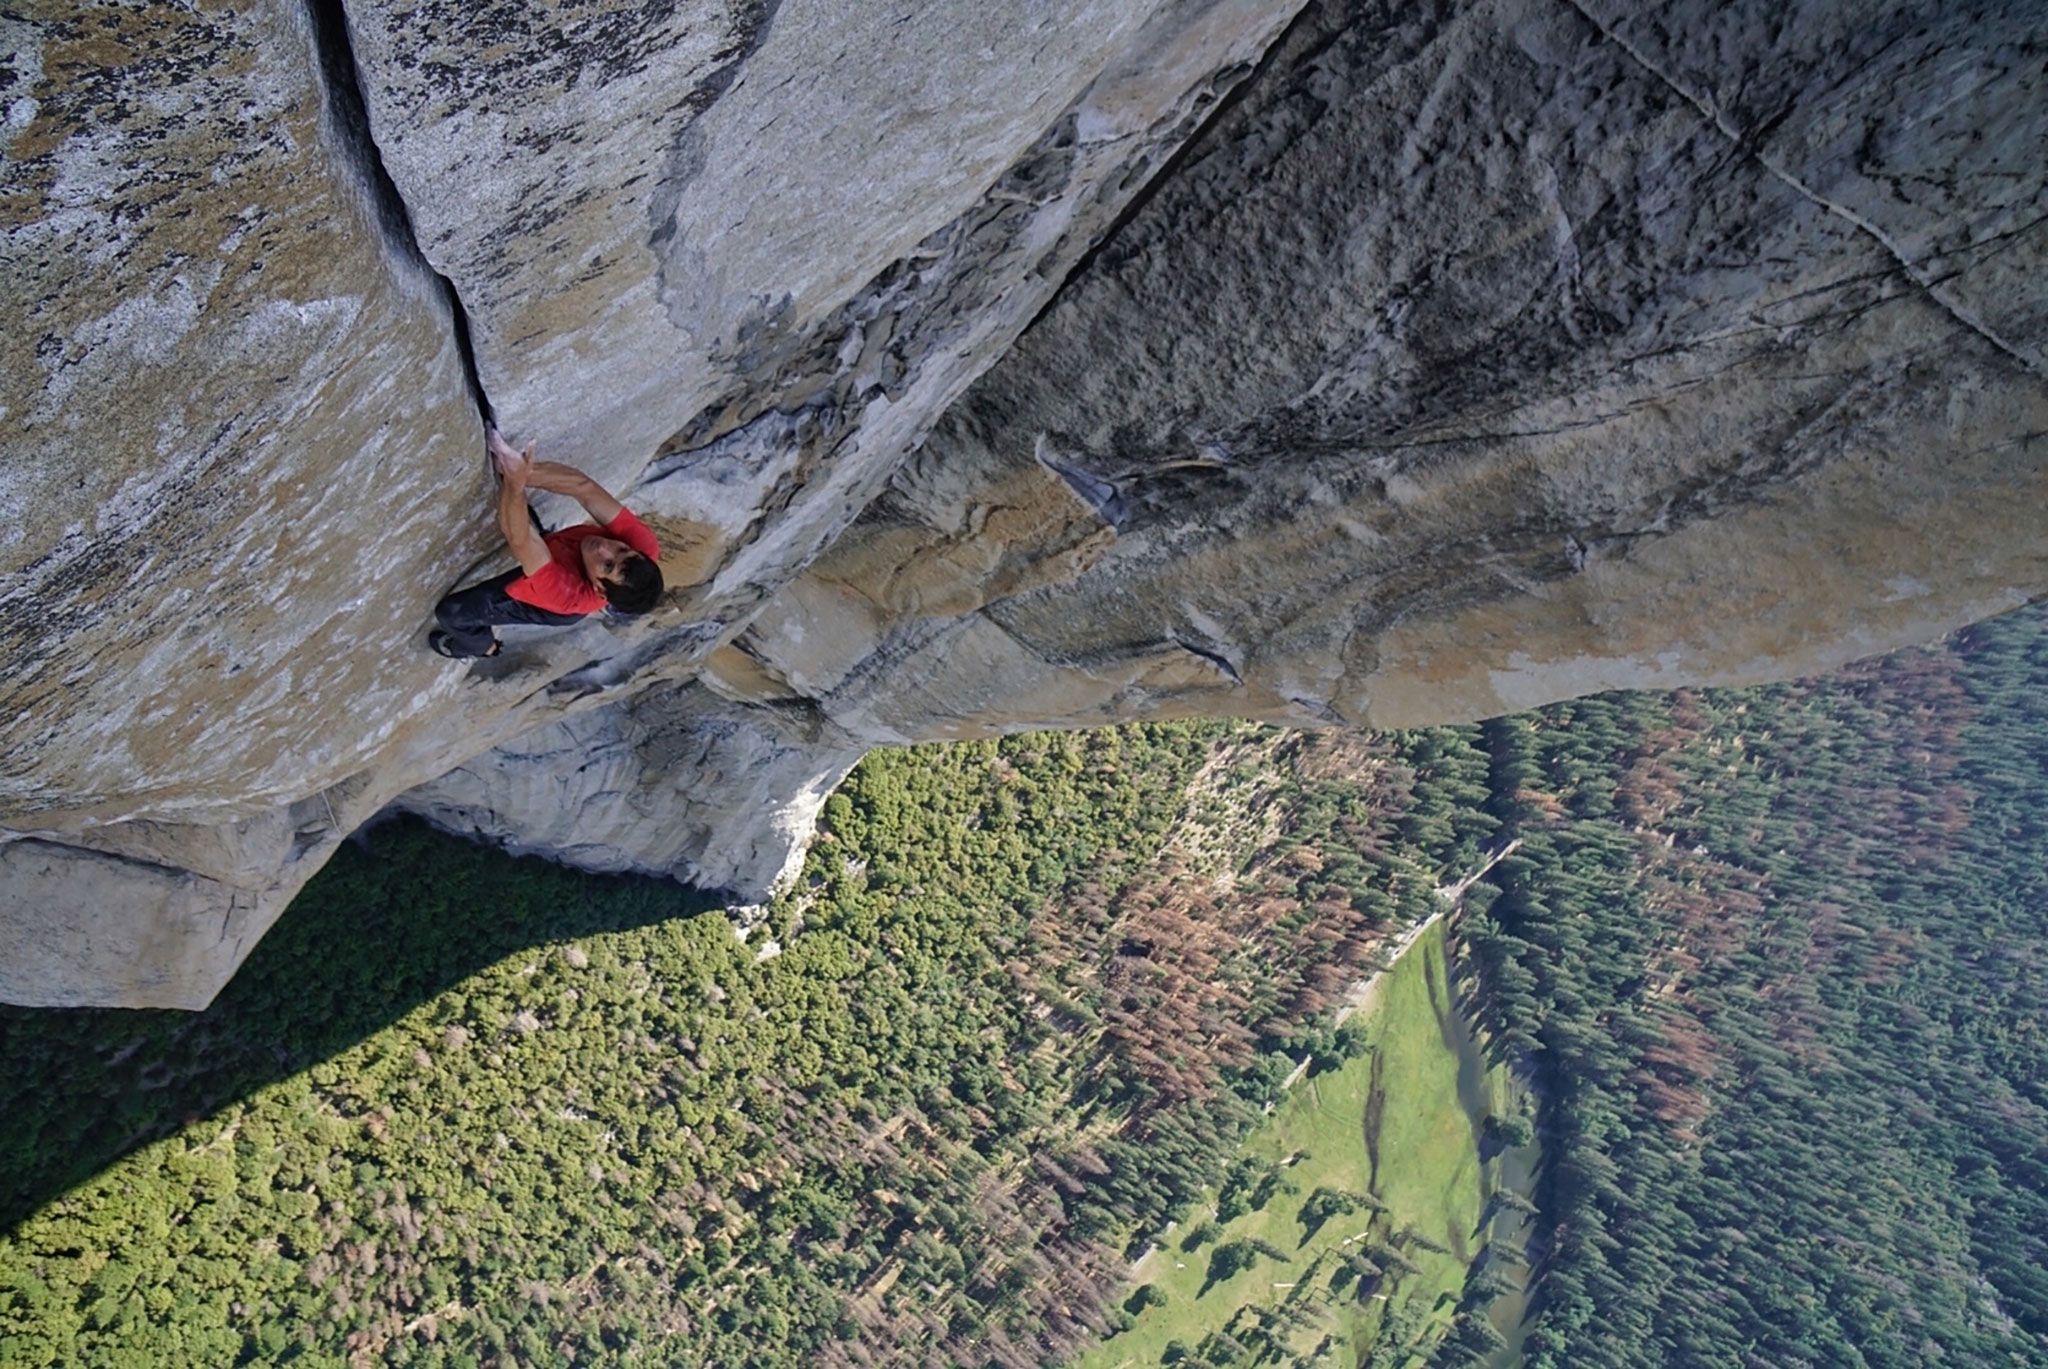 Klettersteig Yosemite : Photos of alex honnolds most epic climbs pinterest